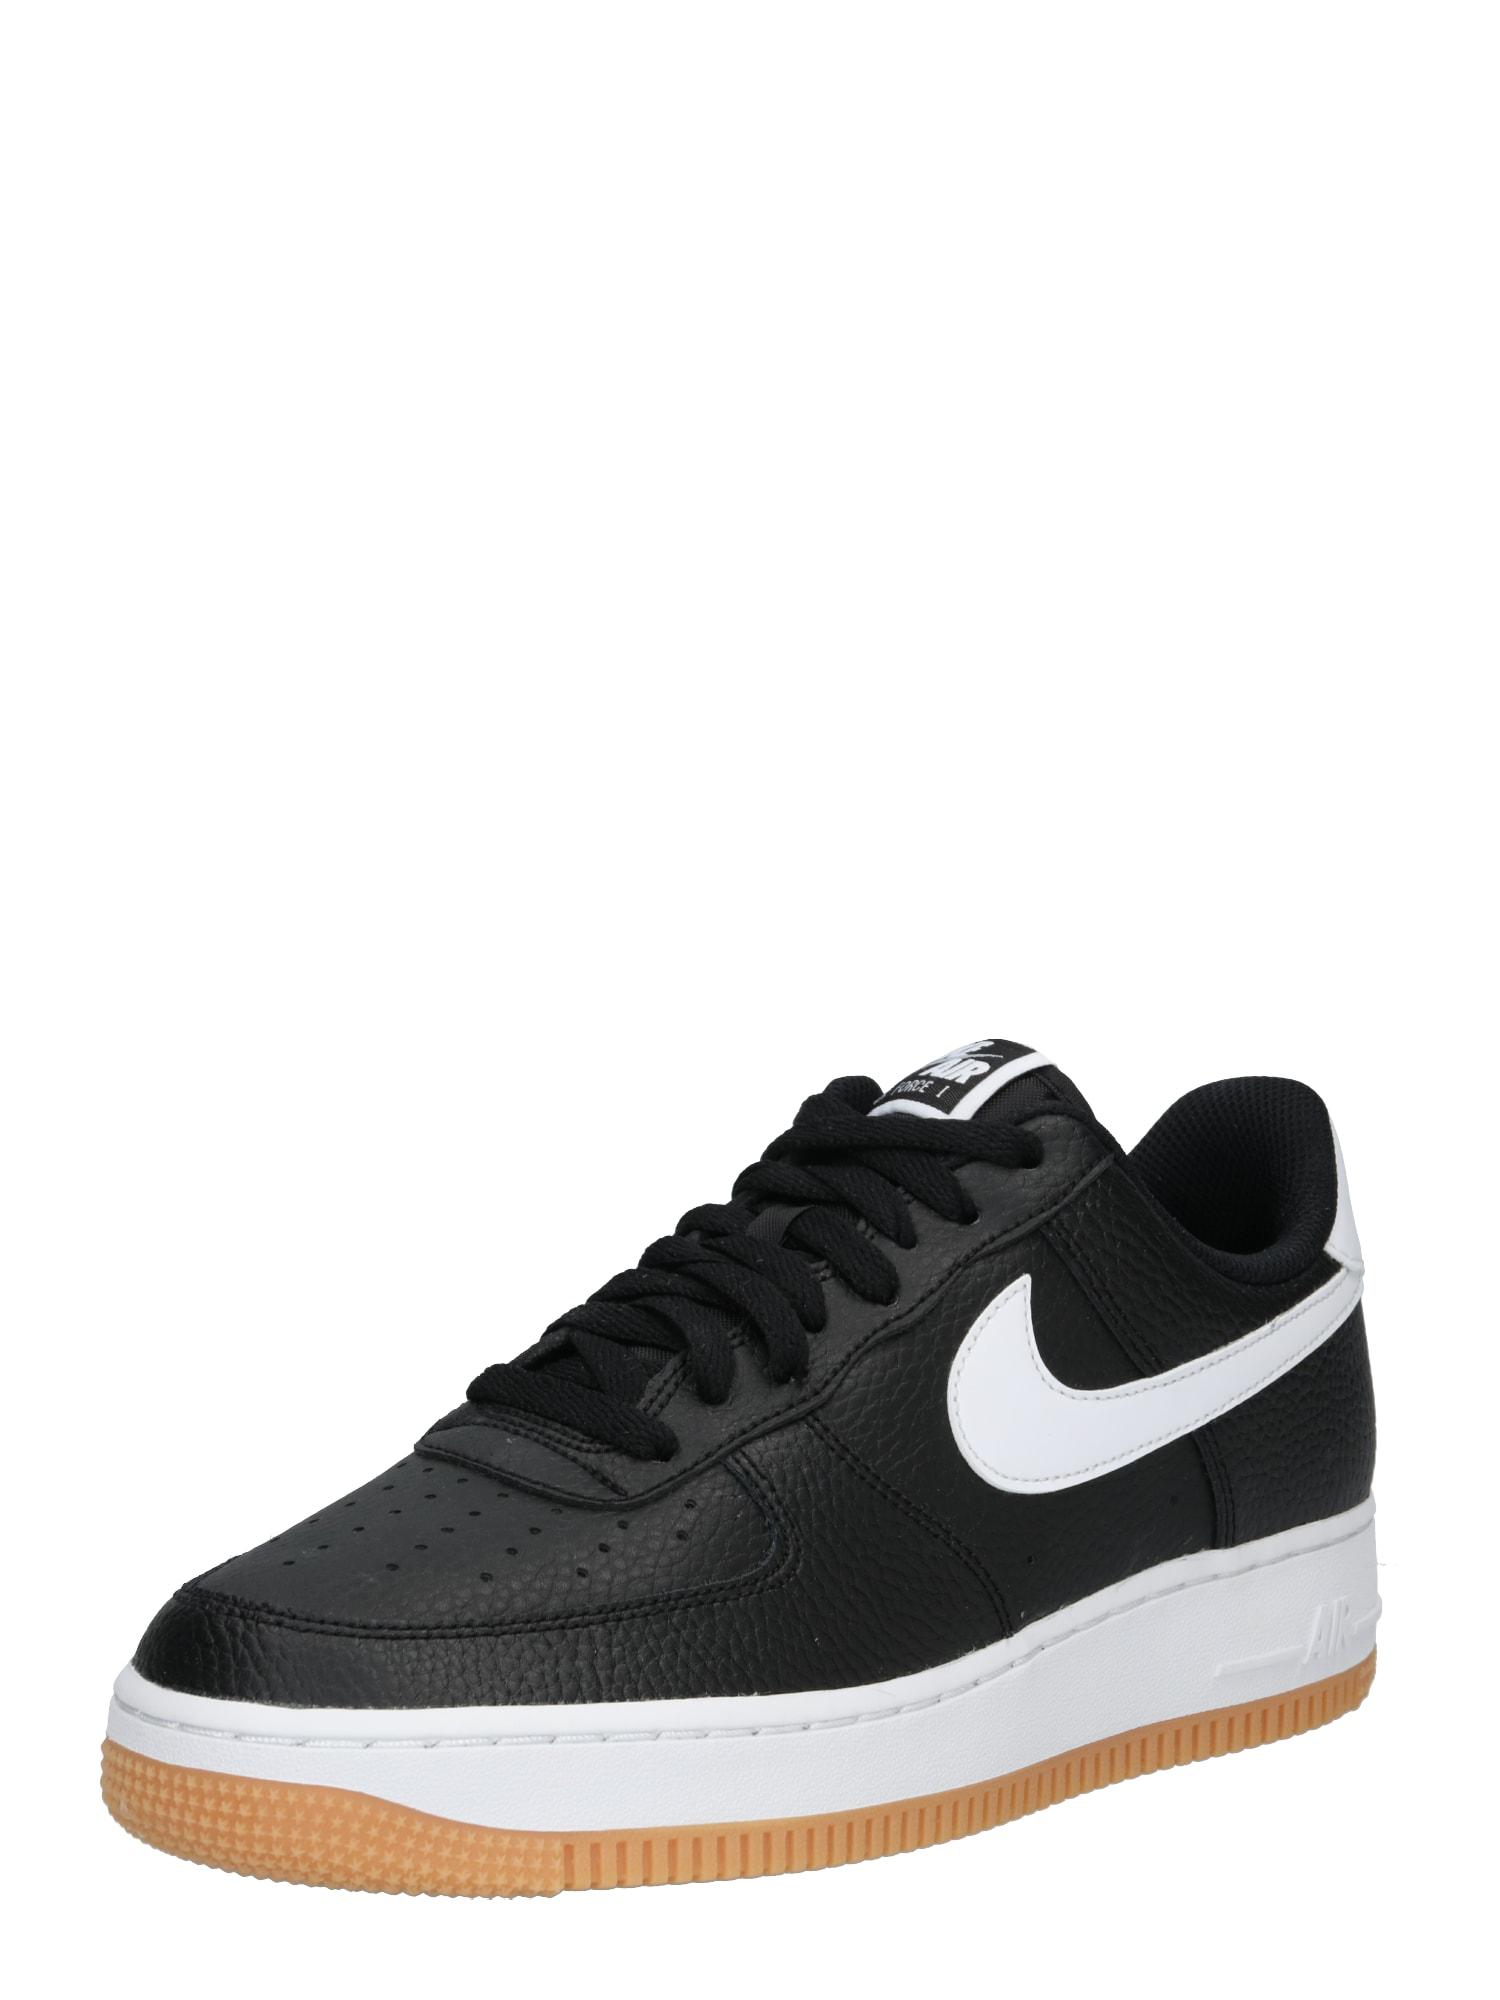 Tenisky AIR FORCE 1 07 2FA19 černá bílá Nike Sportswear